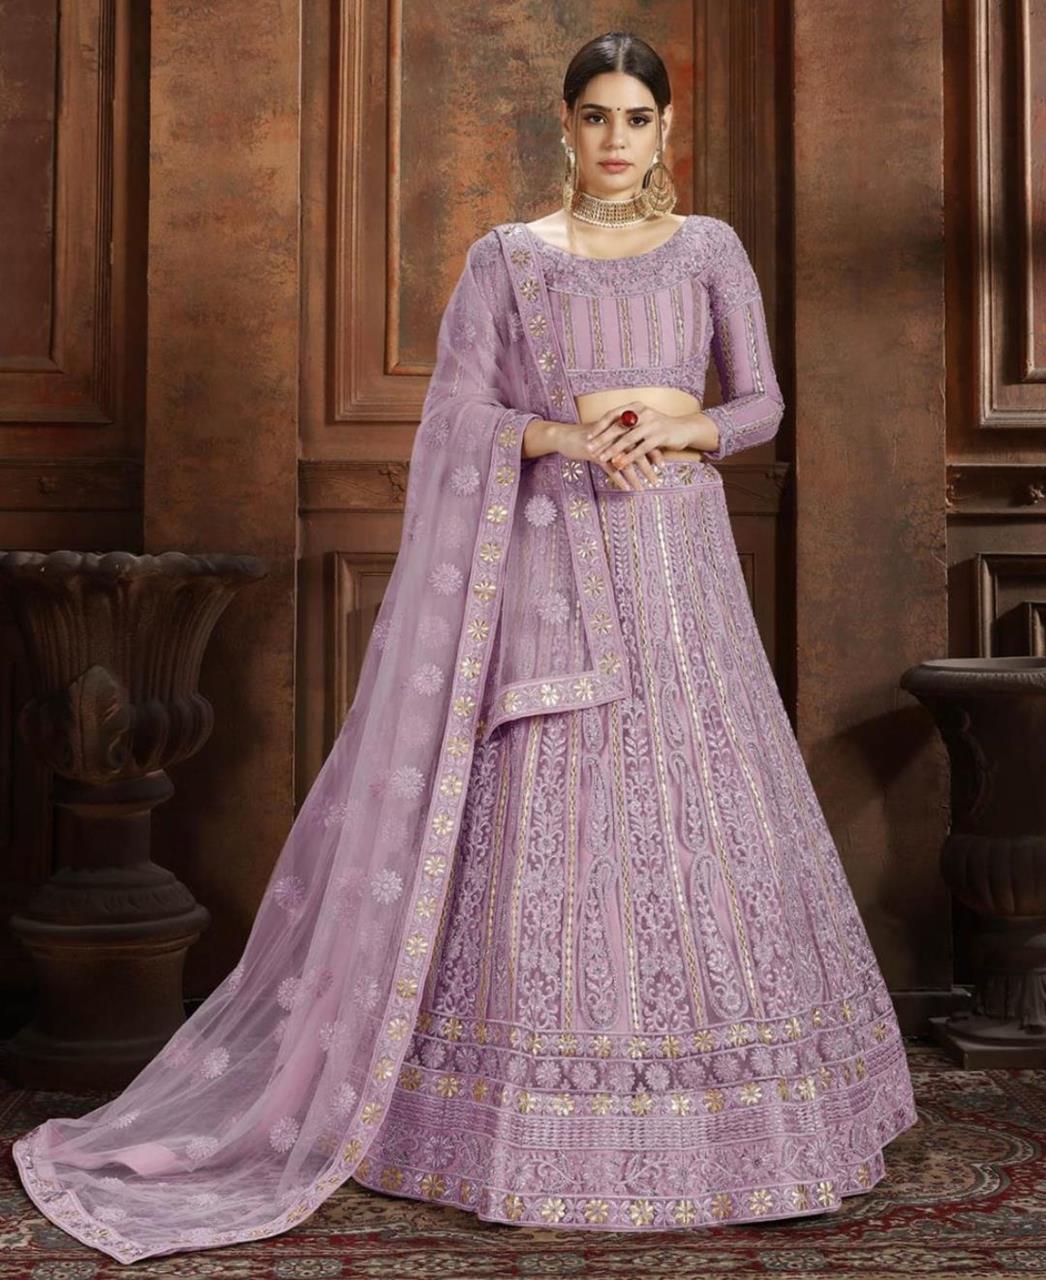 Embroidered Net Lavender Circular Lehenga Choli